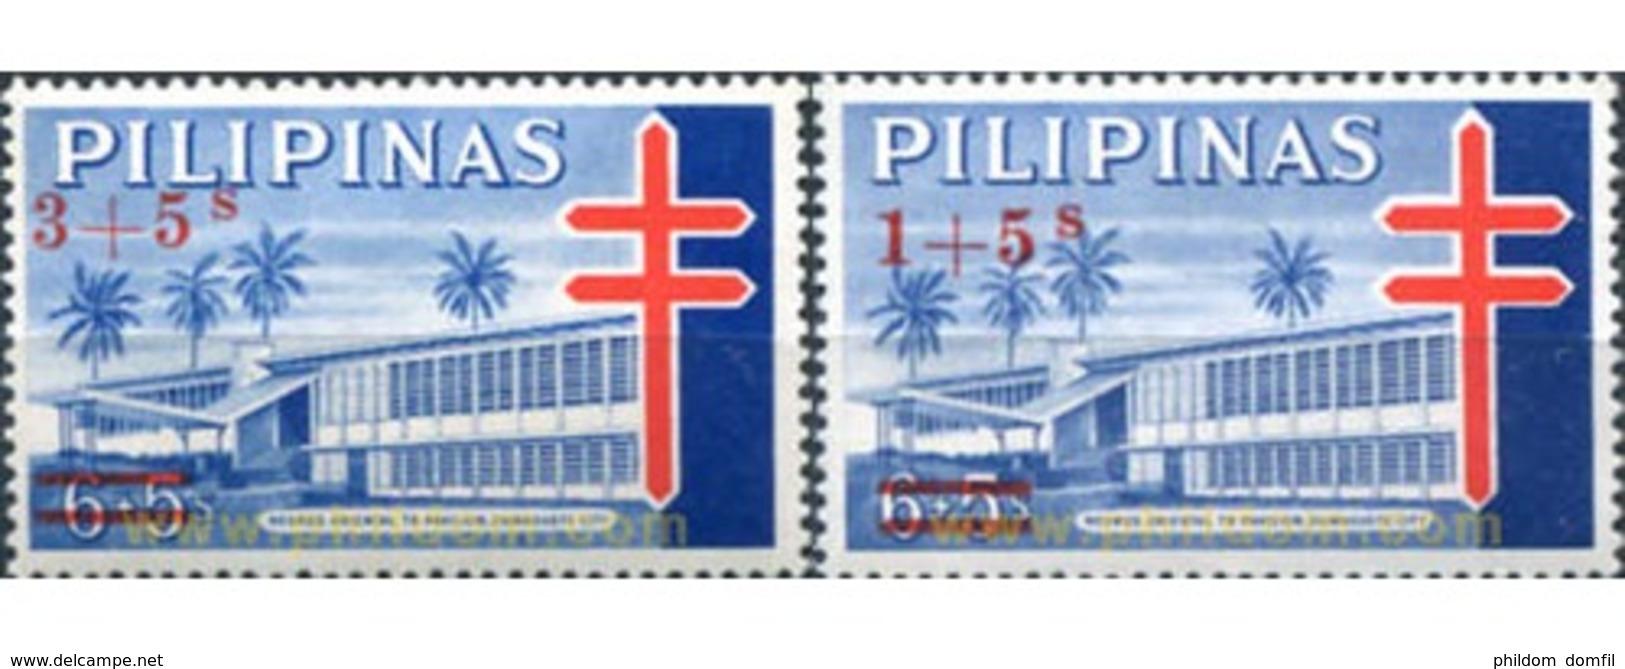 Ref. 312888 * MNH * - PHILIPPINES. 1965. TUBERCULOSIS - Filipinas